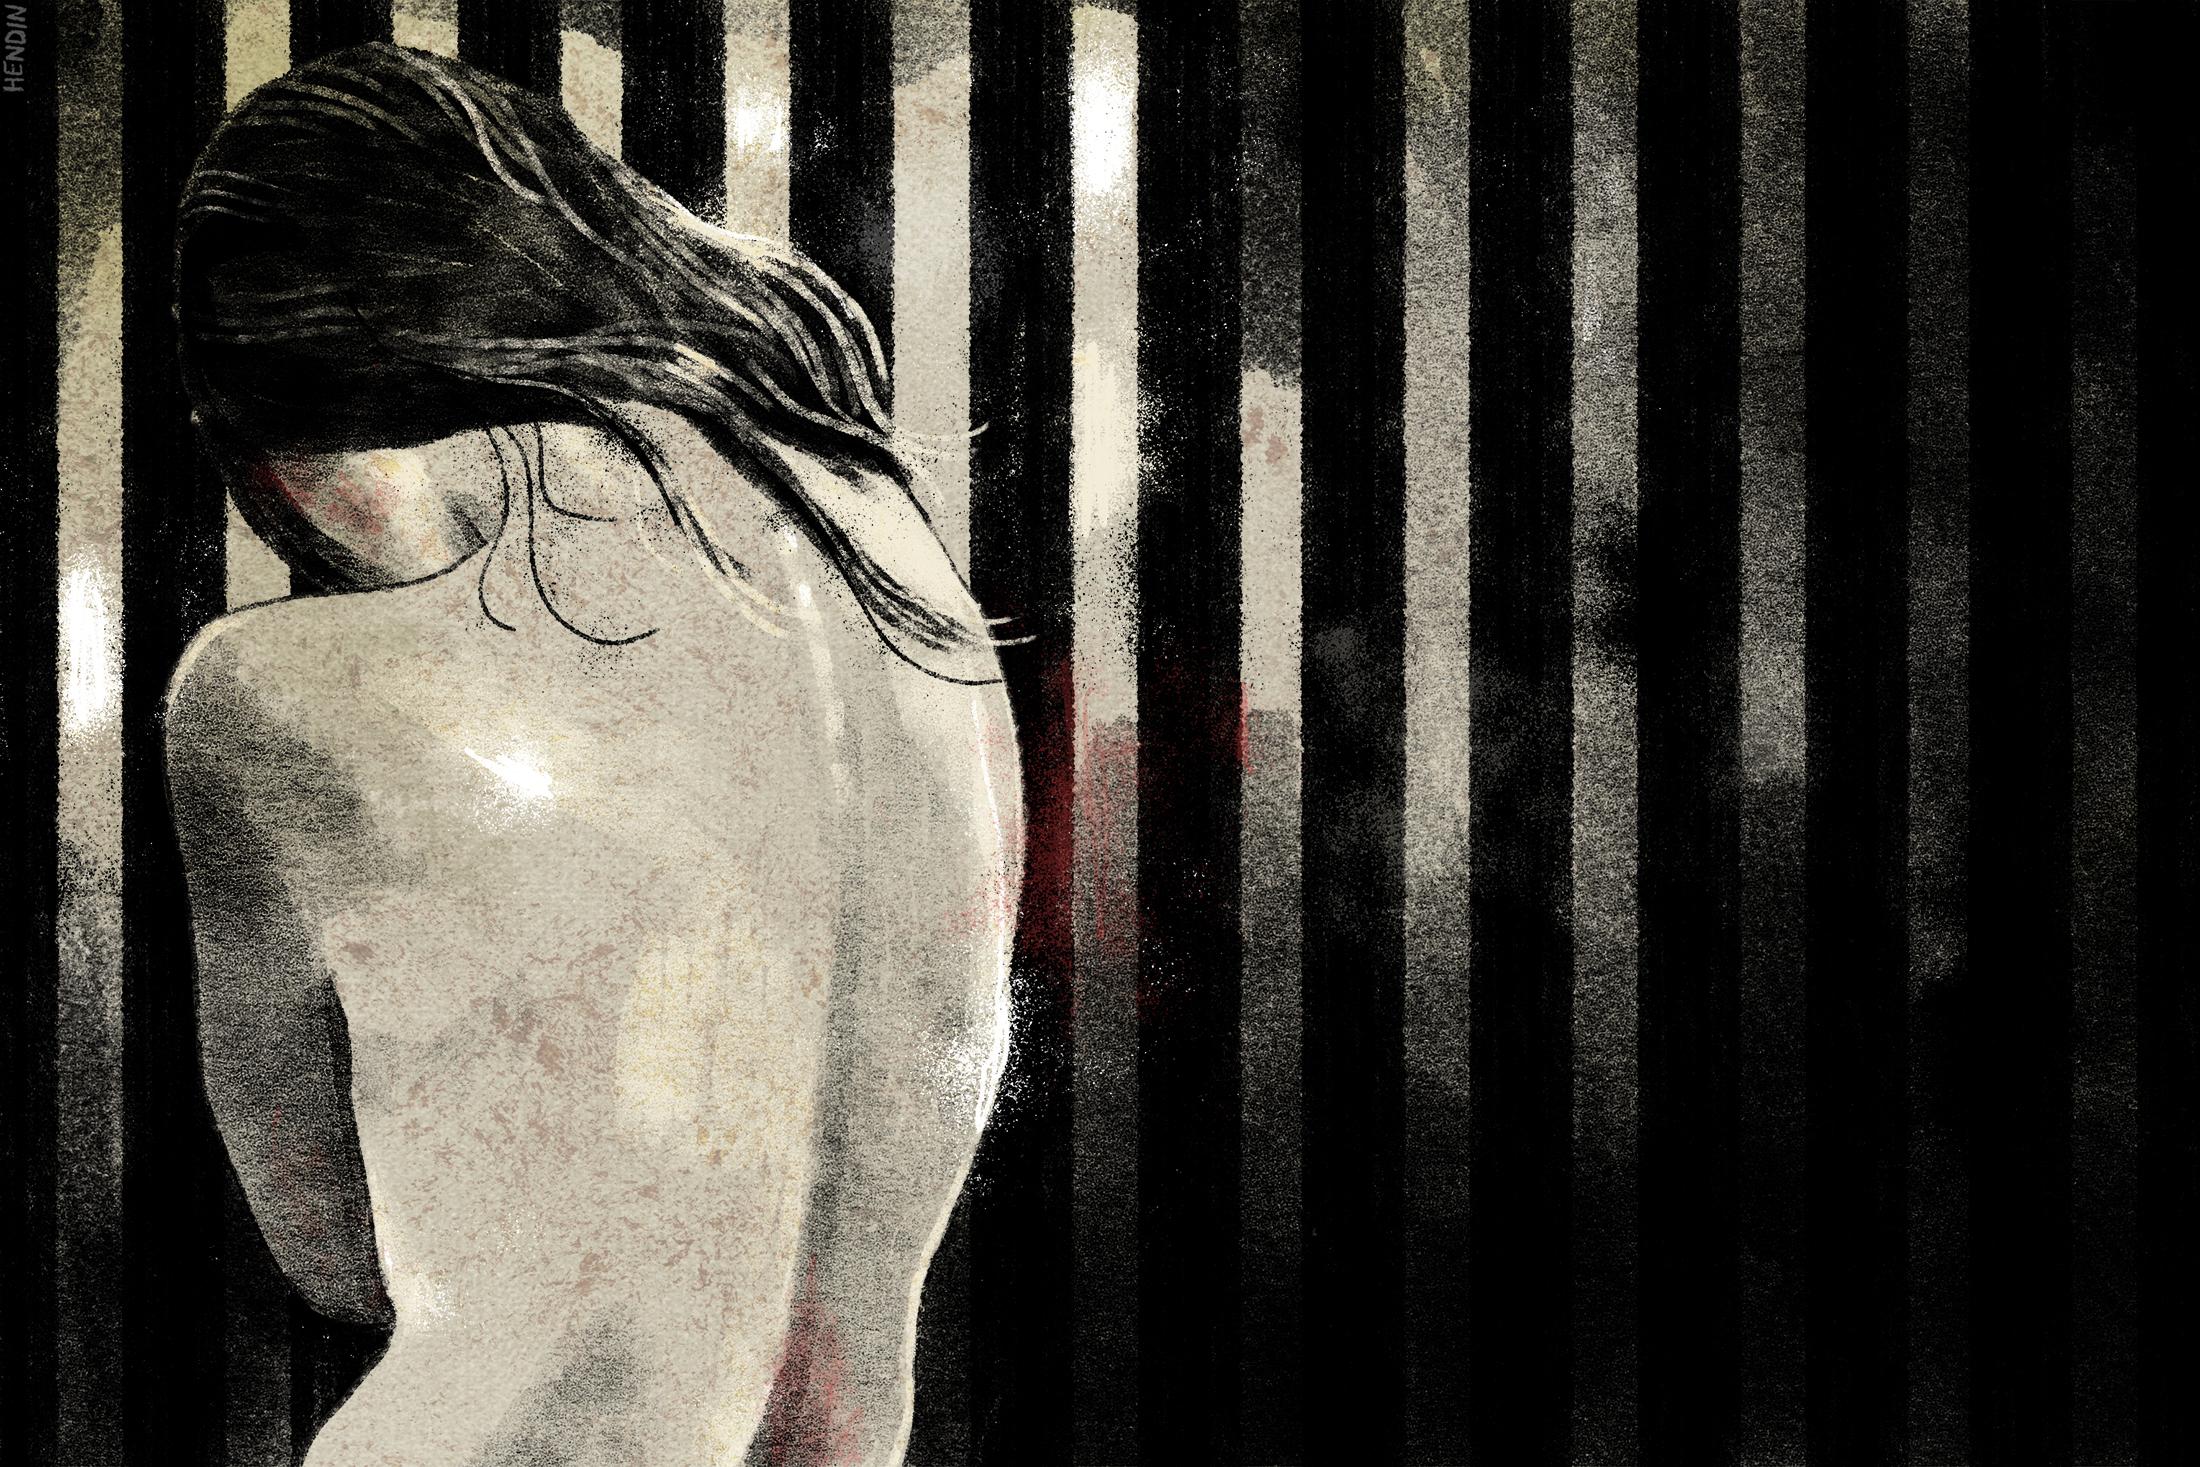 rebecca-hendin-emily-dugan-women-prisoners-strip-search-buzzfeed-uk-illustration-4